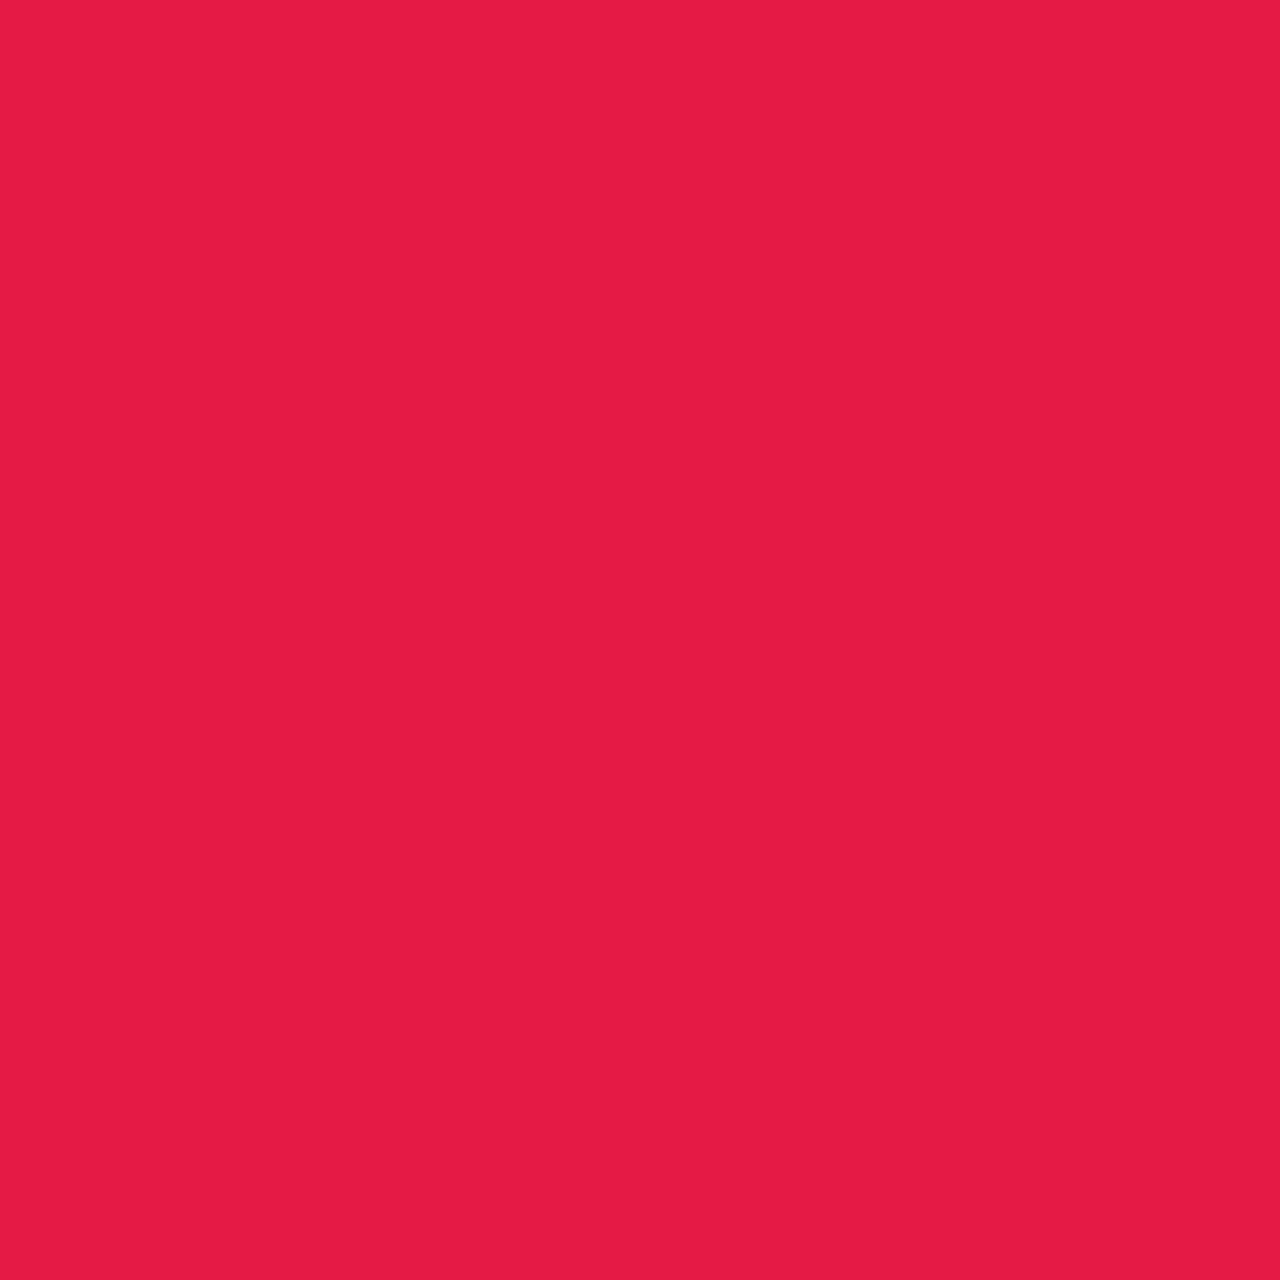 Team Red Room